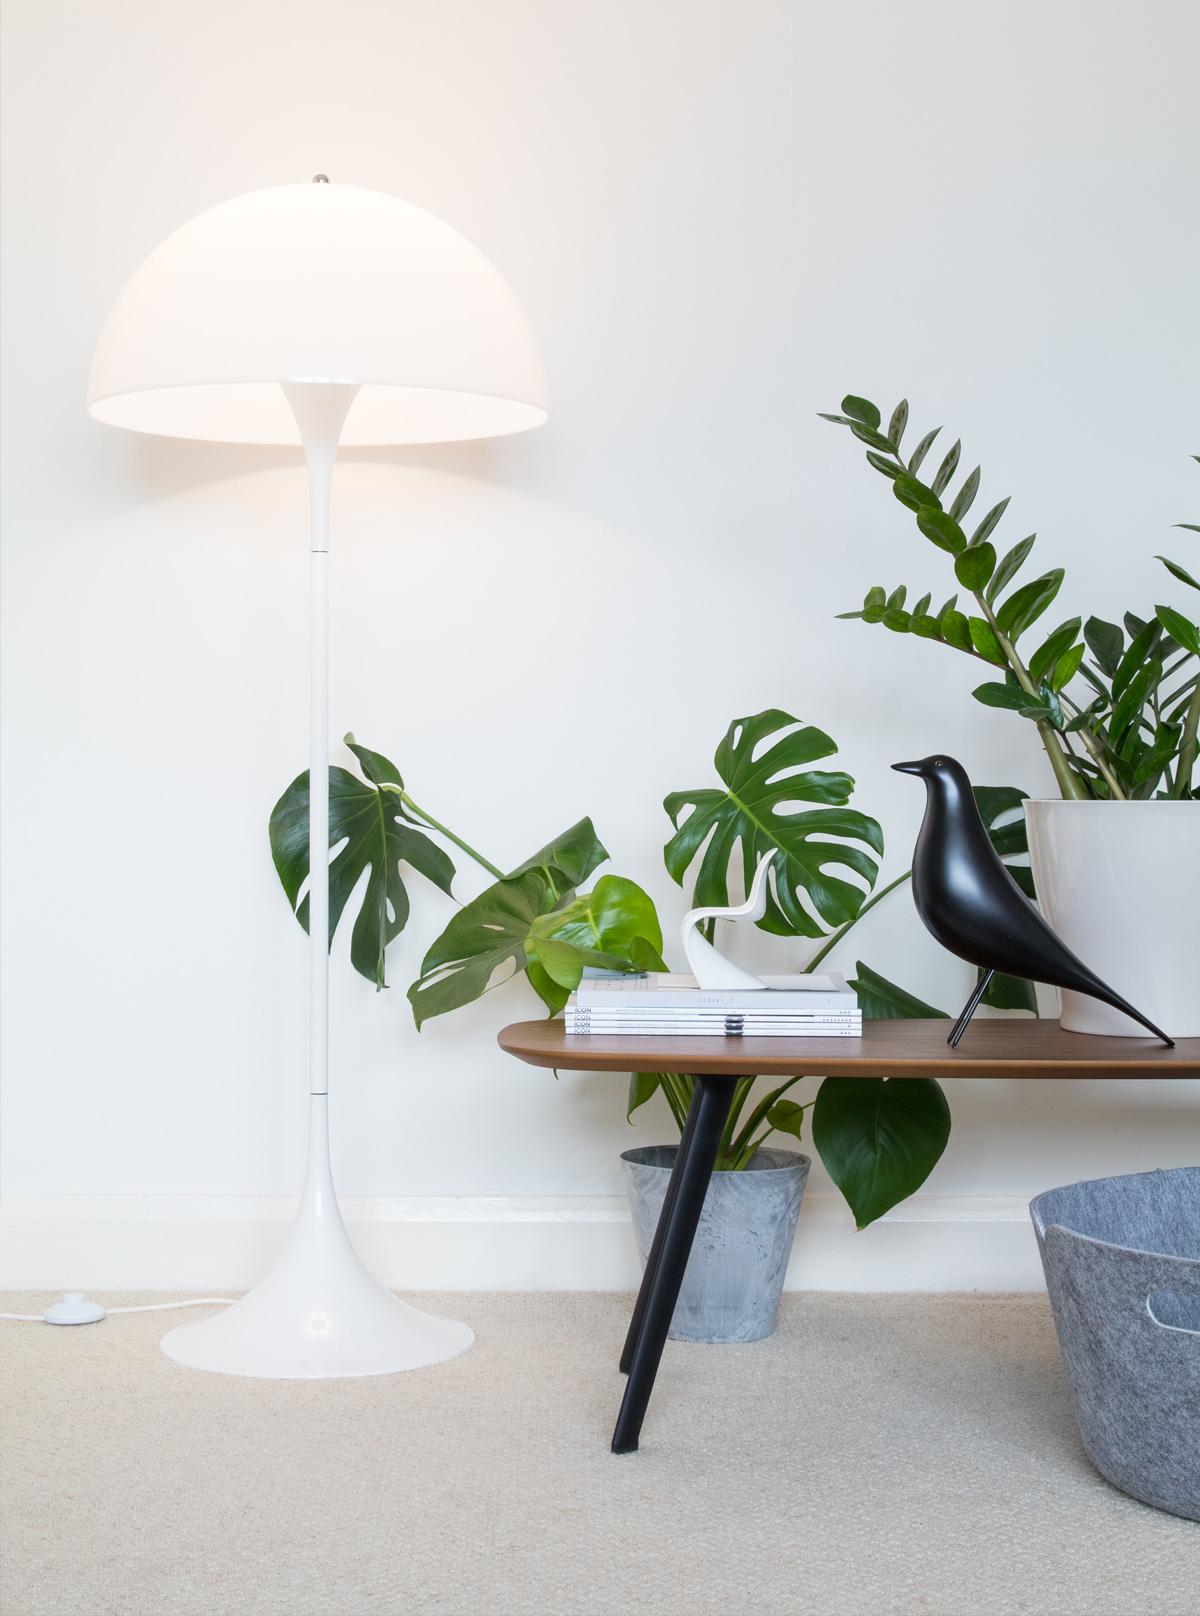 Nestcouk-Top-Design-Picks-Louis-Panthella-Floor-Lamp.jpg